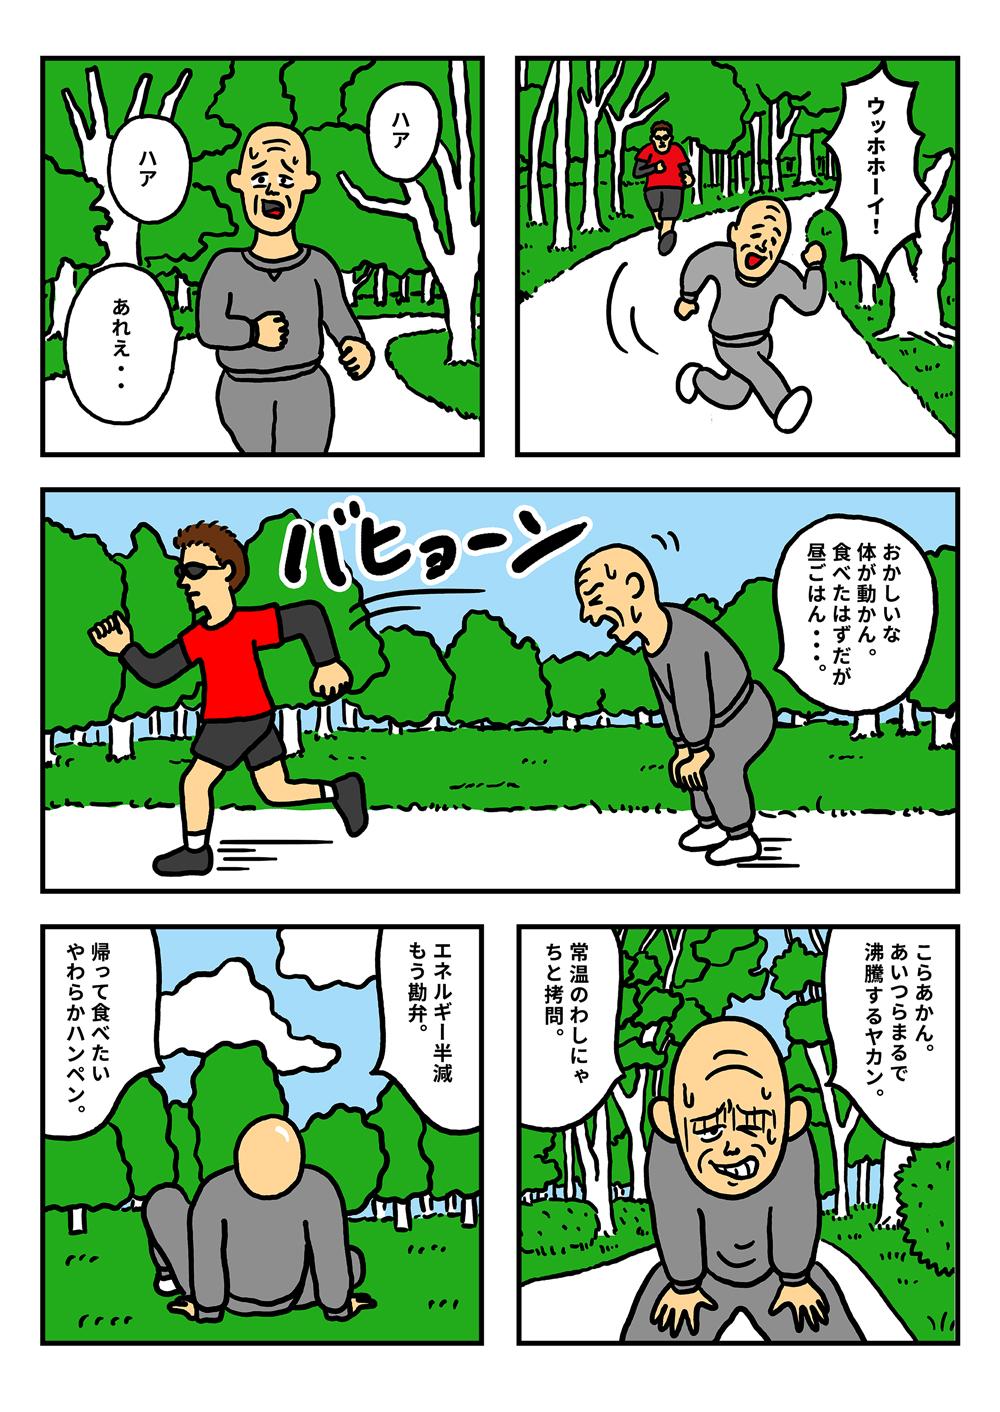 himuro-001-2